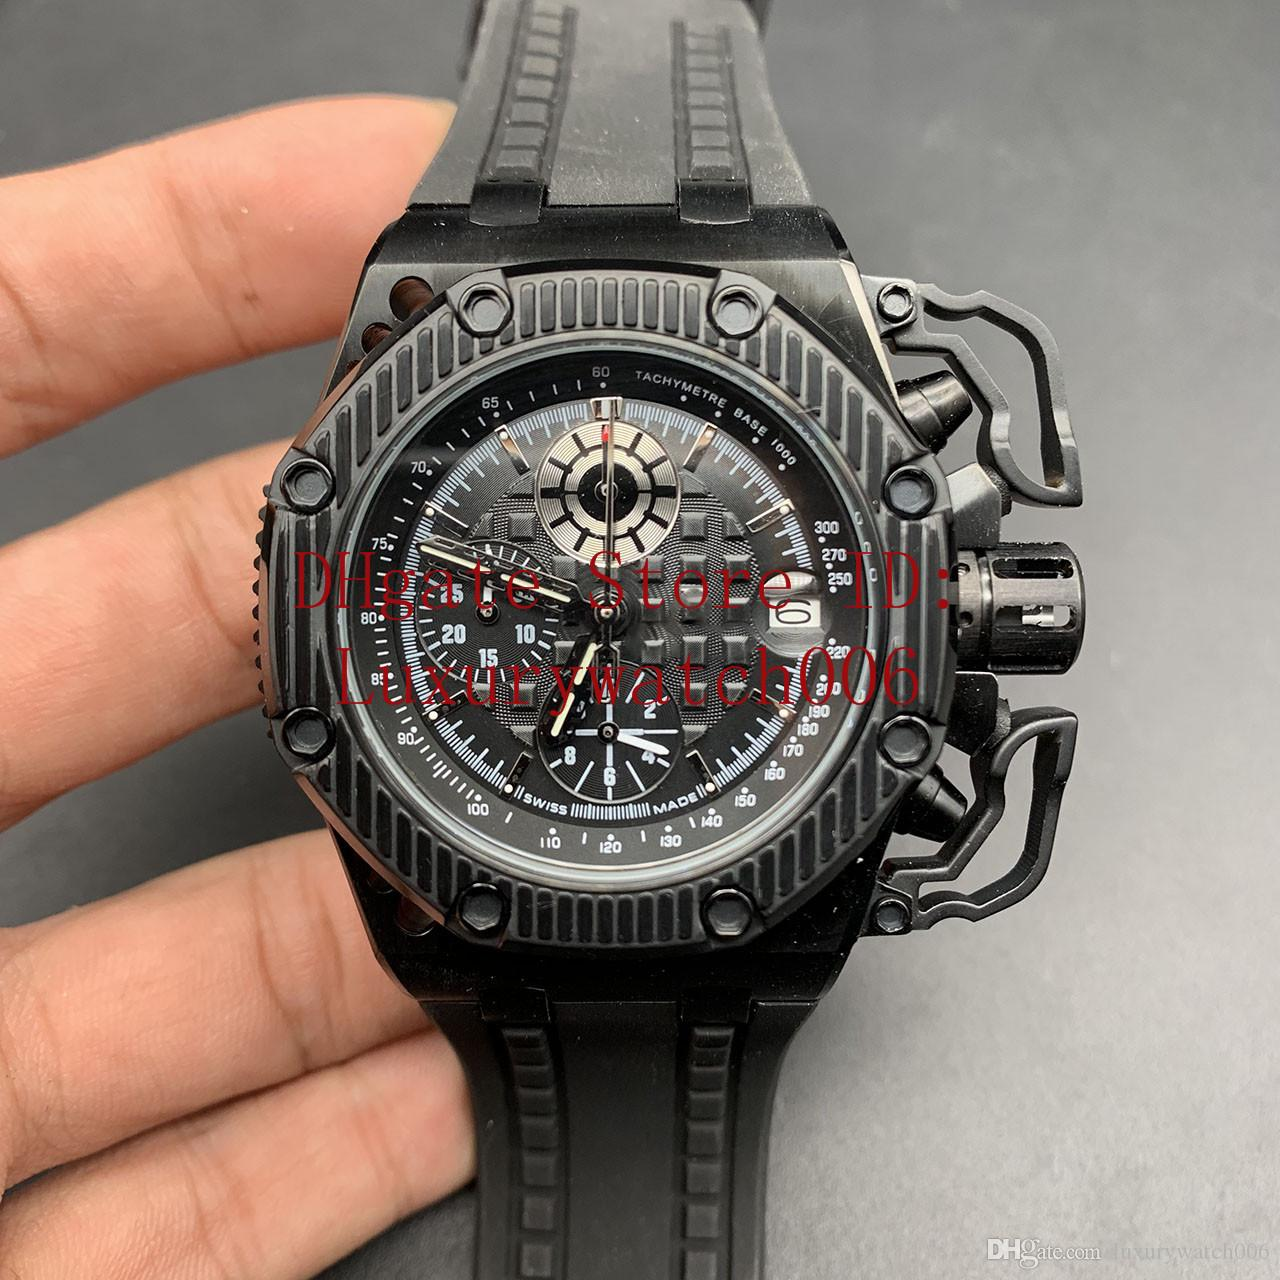 2020 Volle schwarze Uhren Famous Moderne Herrenmode-Uhr-beiläufige Mens VK-Quarz-Chronograph-Sport-Uhr 42mm